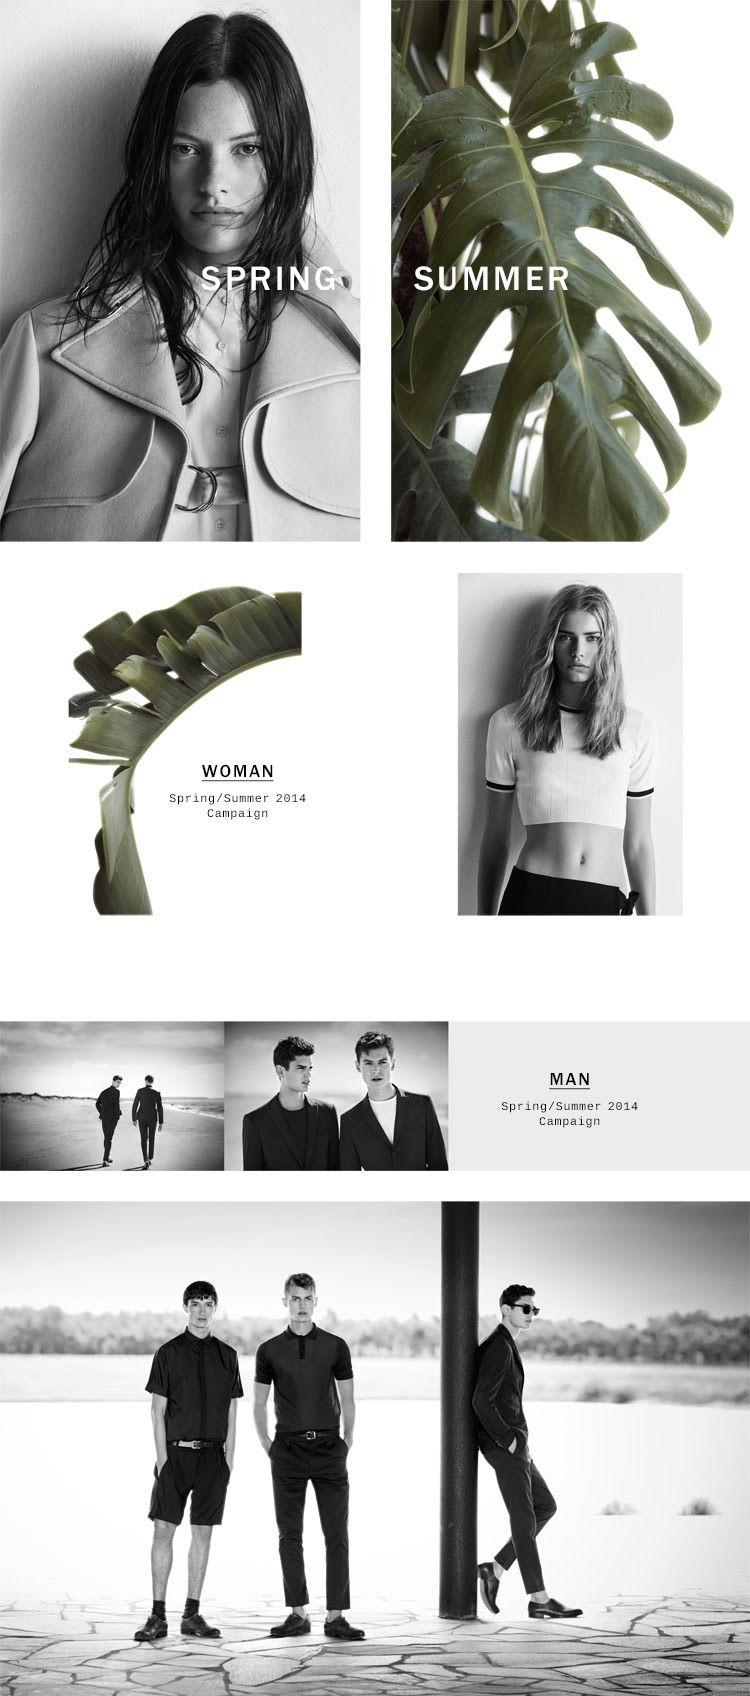 Zara poster design - Zara S S 2014 Campaign Graphics Design Photography Branding